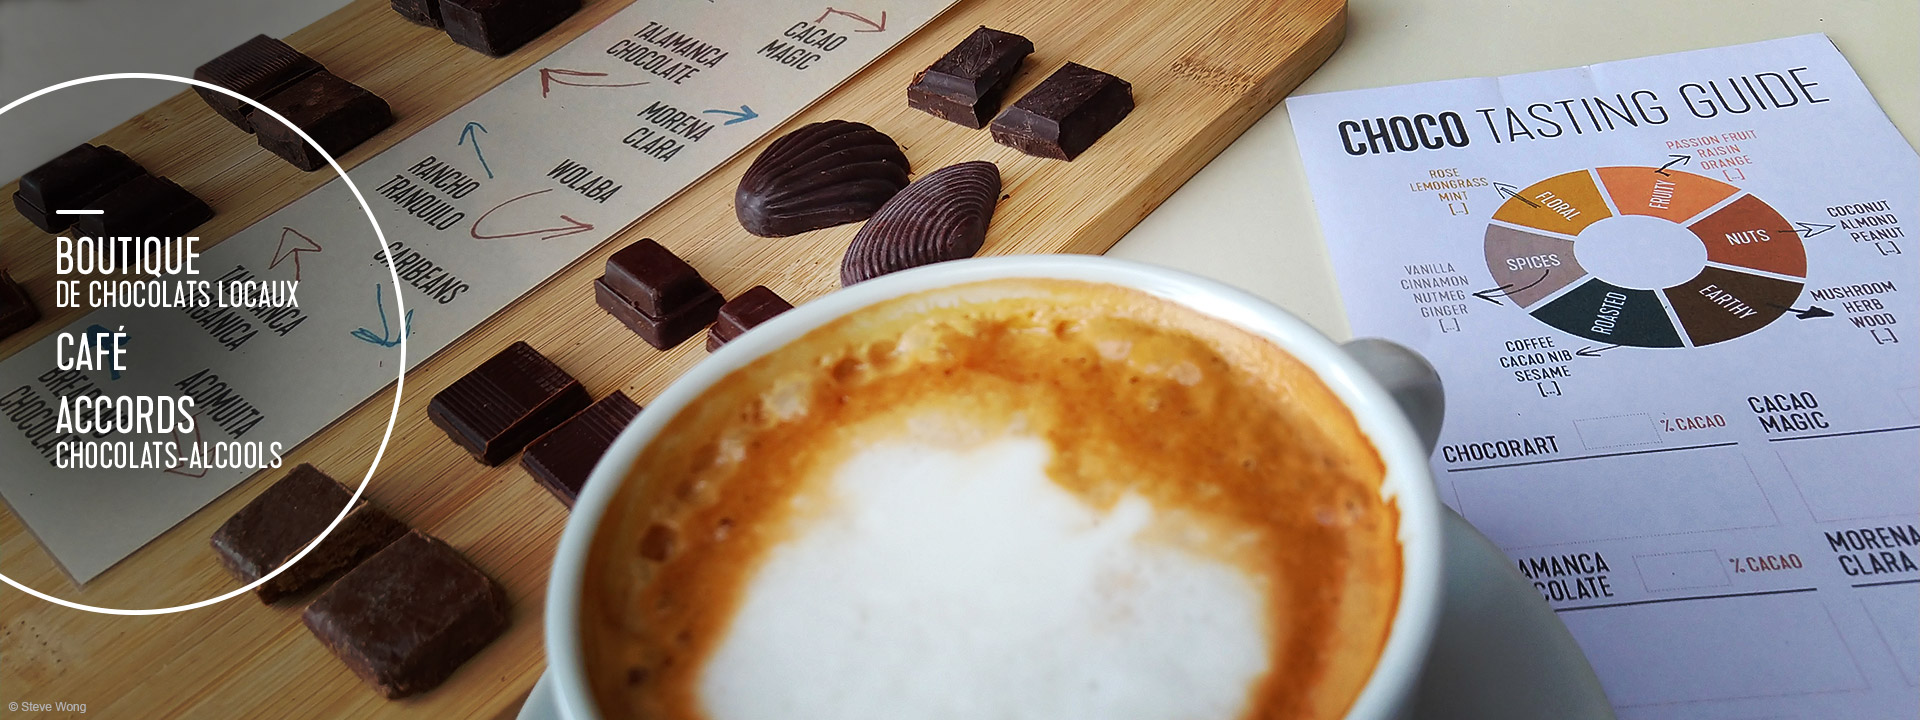 Choco - Chocolats Puerto Viejo